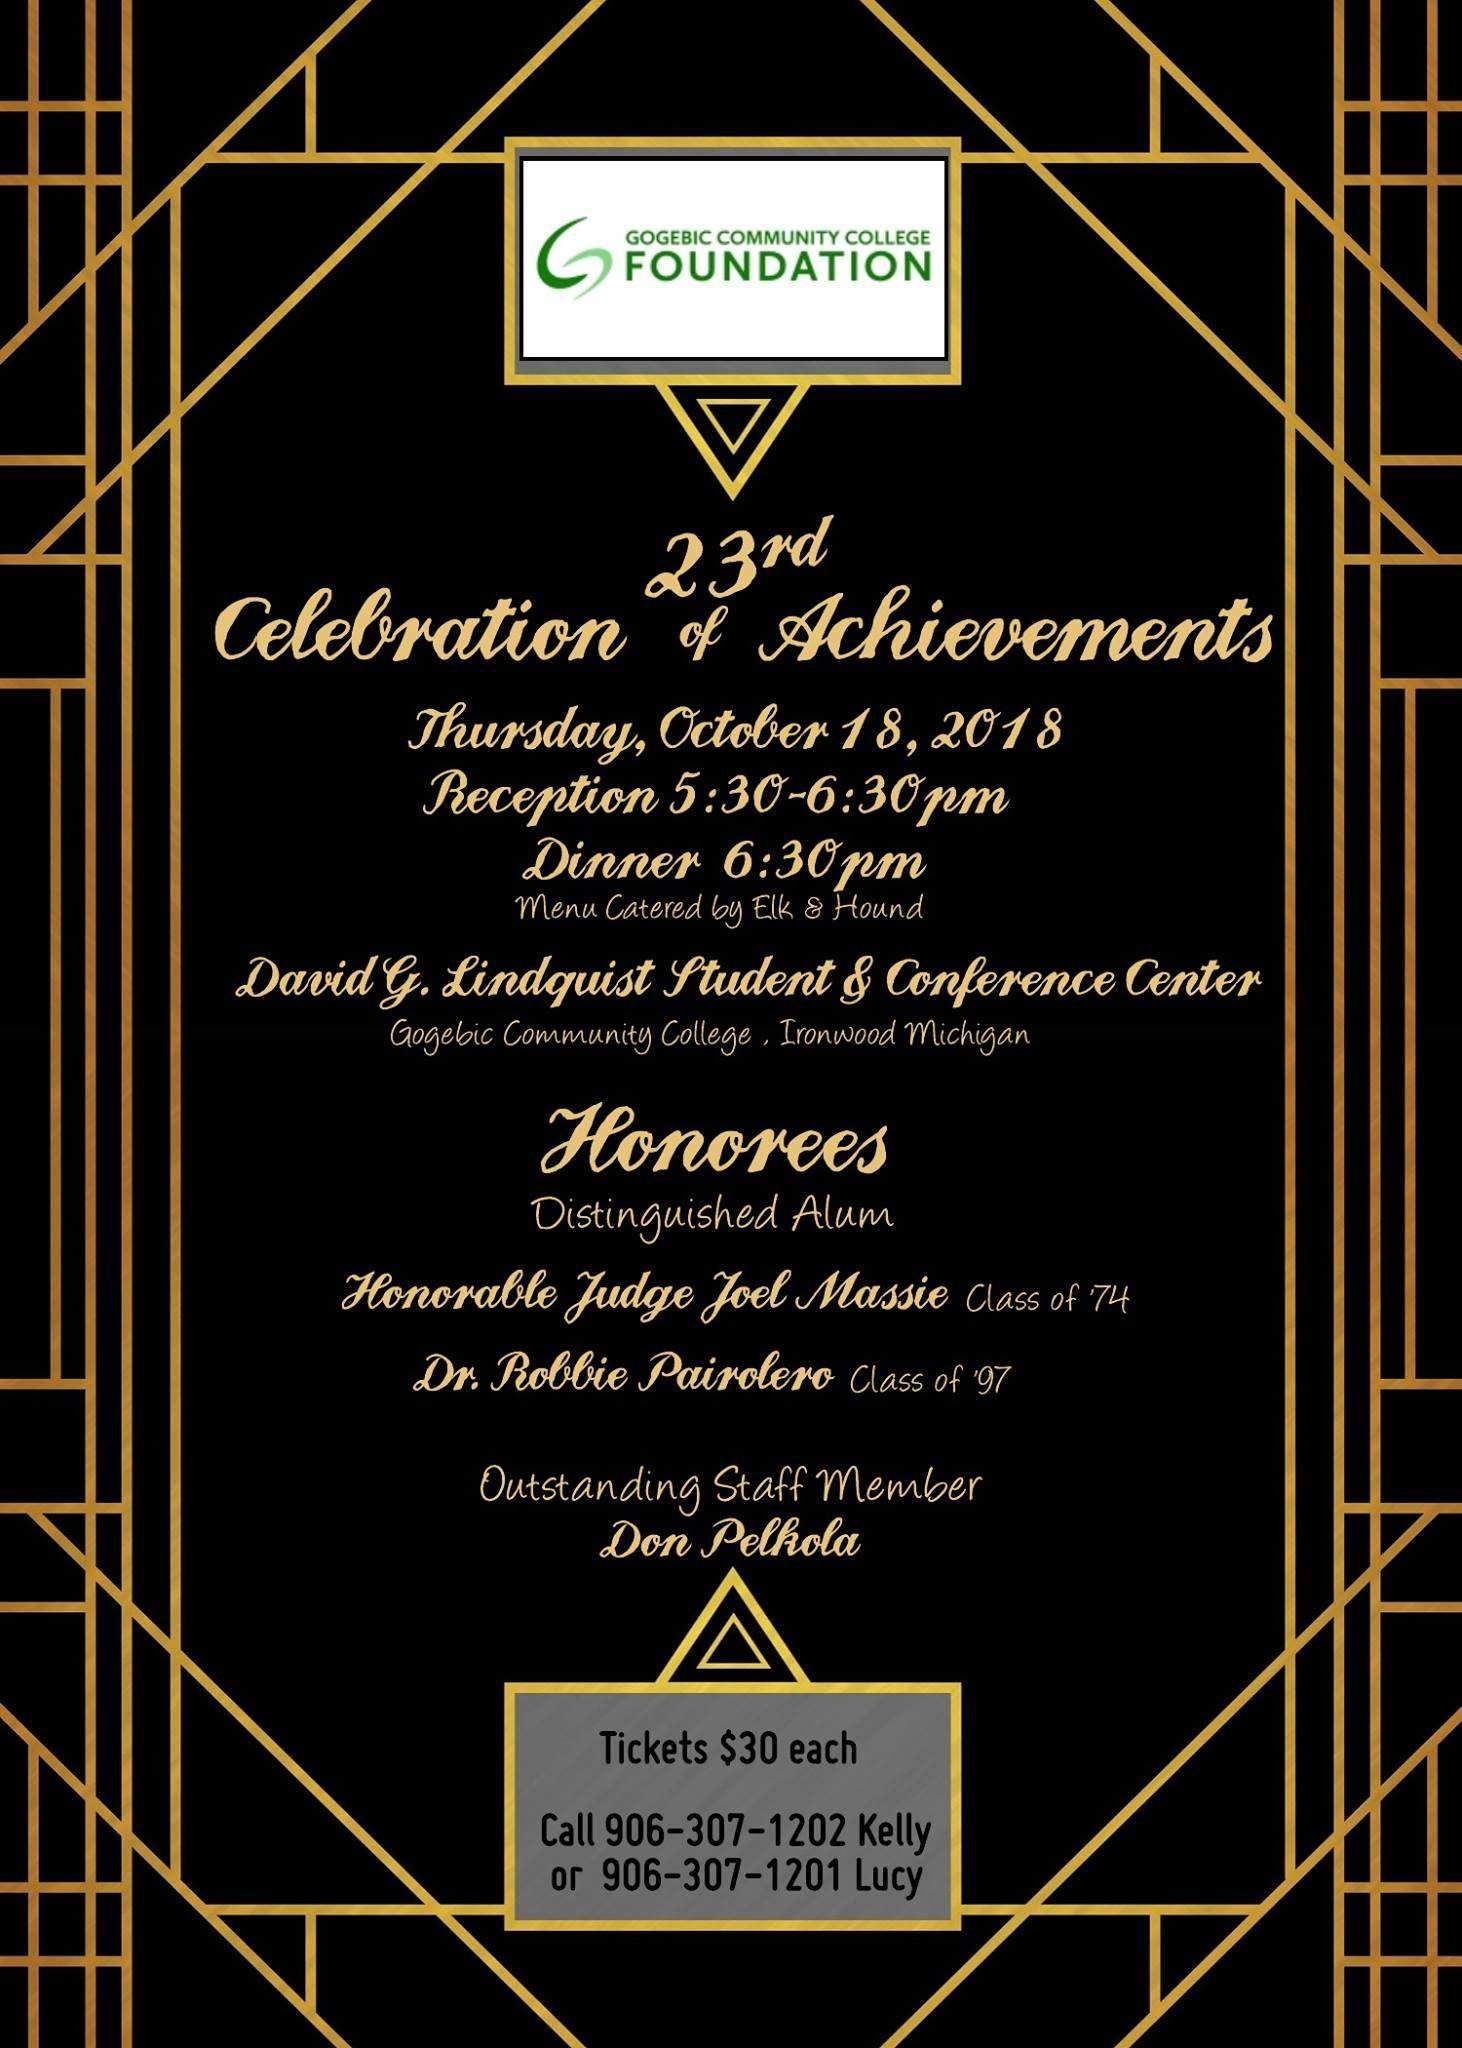 GCC Foundation 23rd Annual Celebration of Achievements Banquet - FeLiveLife  - Gogebic & Iron County Event Calendar